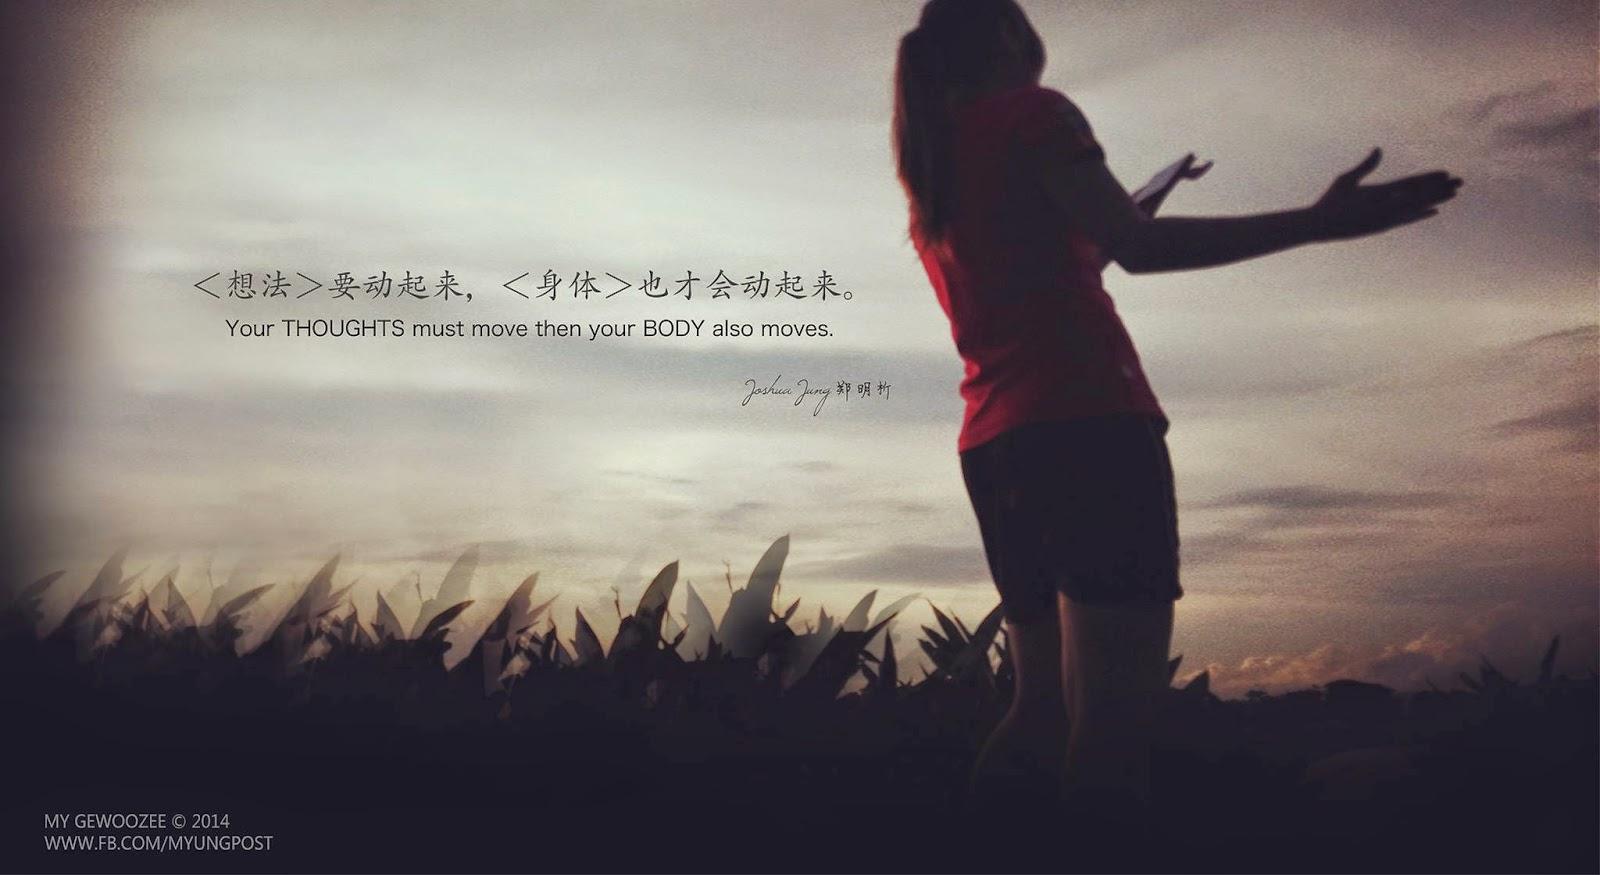 郑明析,摄理,月明洞,赞美,唱歌,草原,天空,Joshua Jung, Providence, Wolmyeong Dong, praising, singing, field, sky